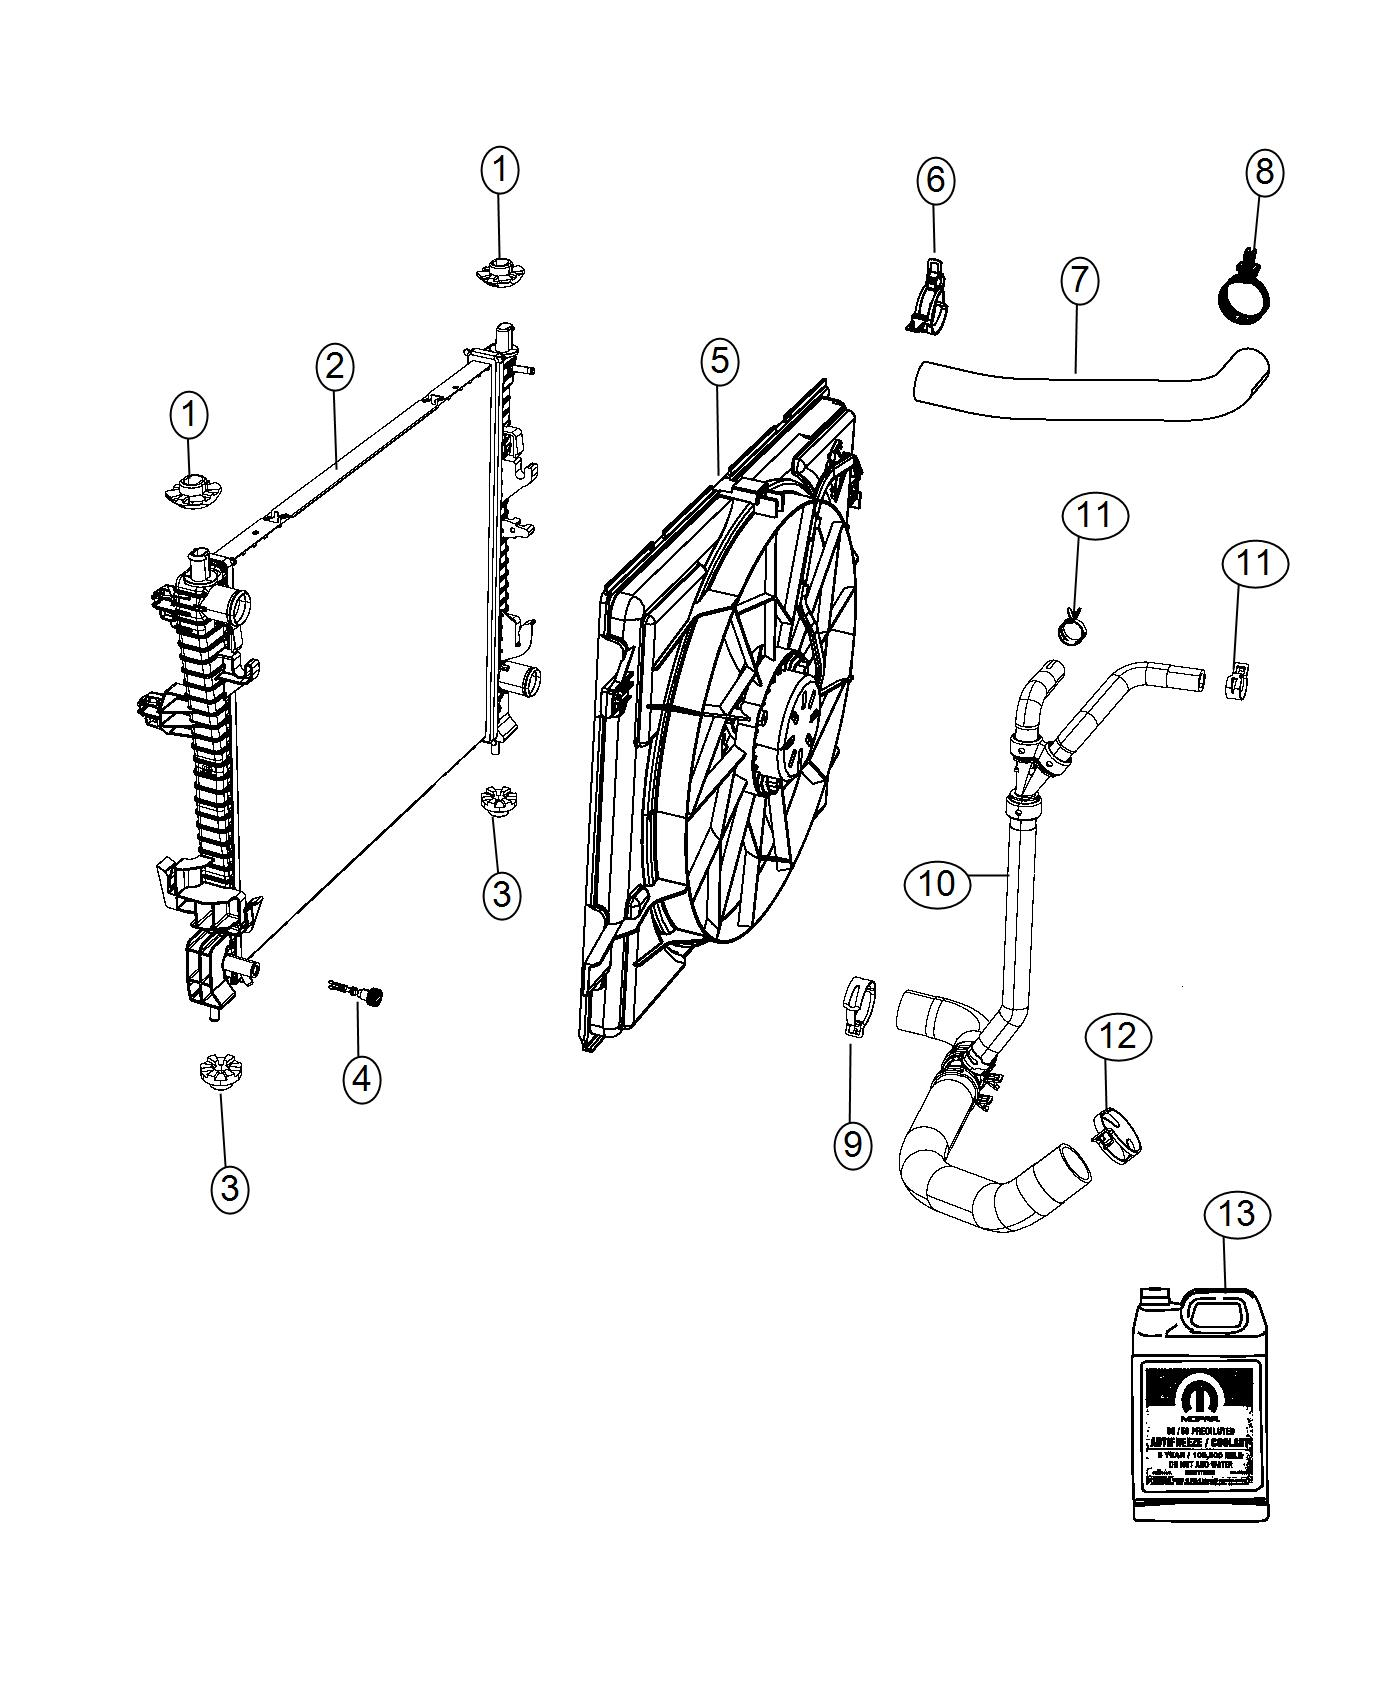 35 Dodge Durango Cooling System Diagram